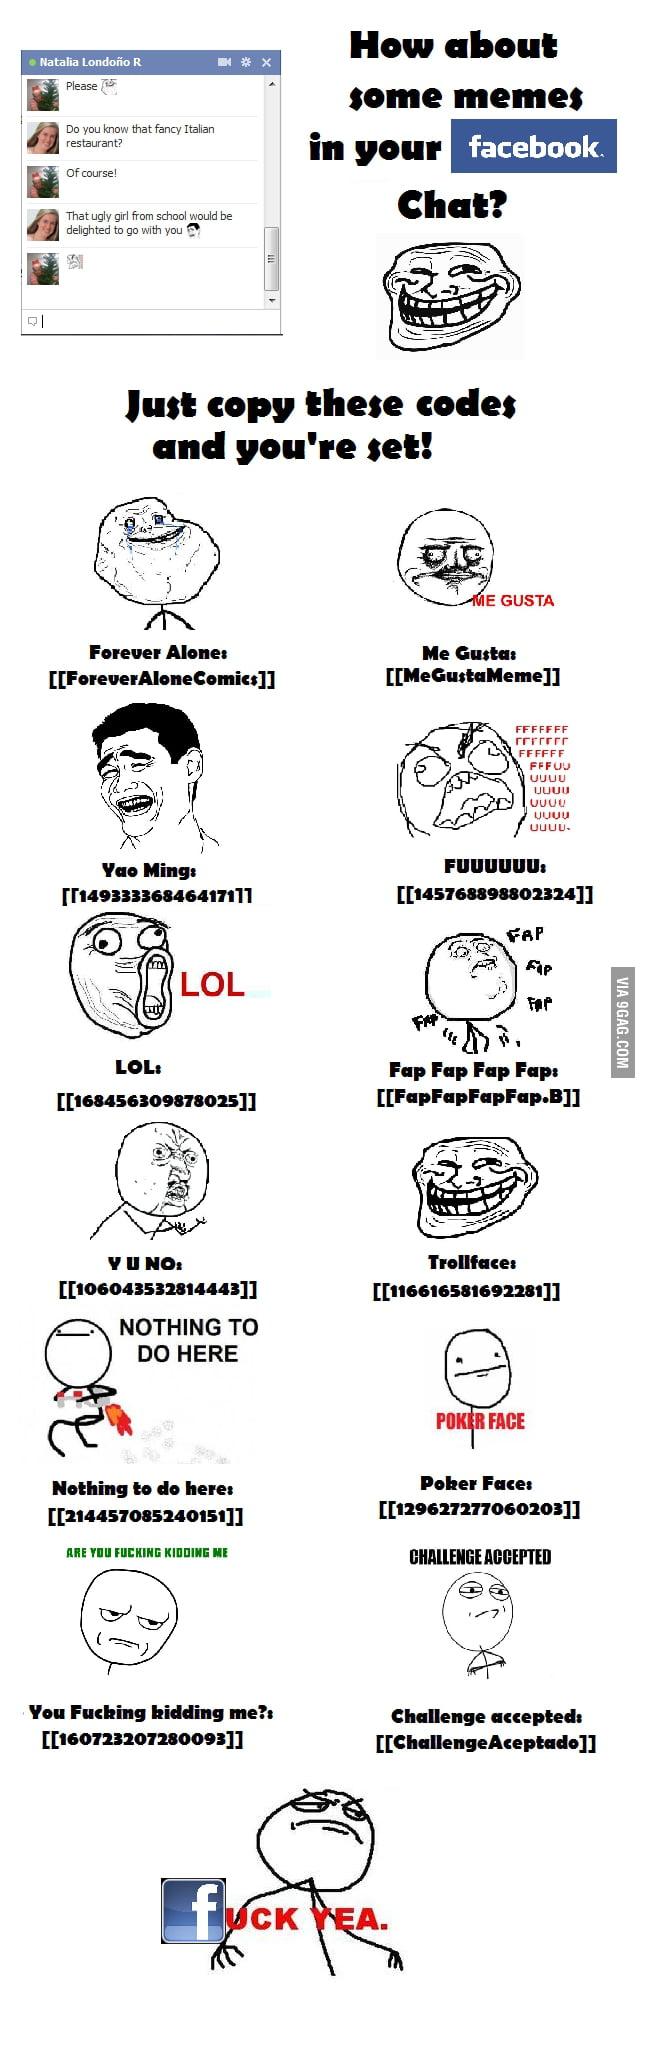 Memes Facebook Chat MEMES FACEBOOK CHAT